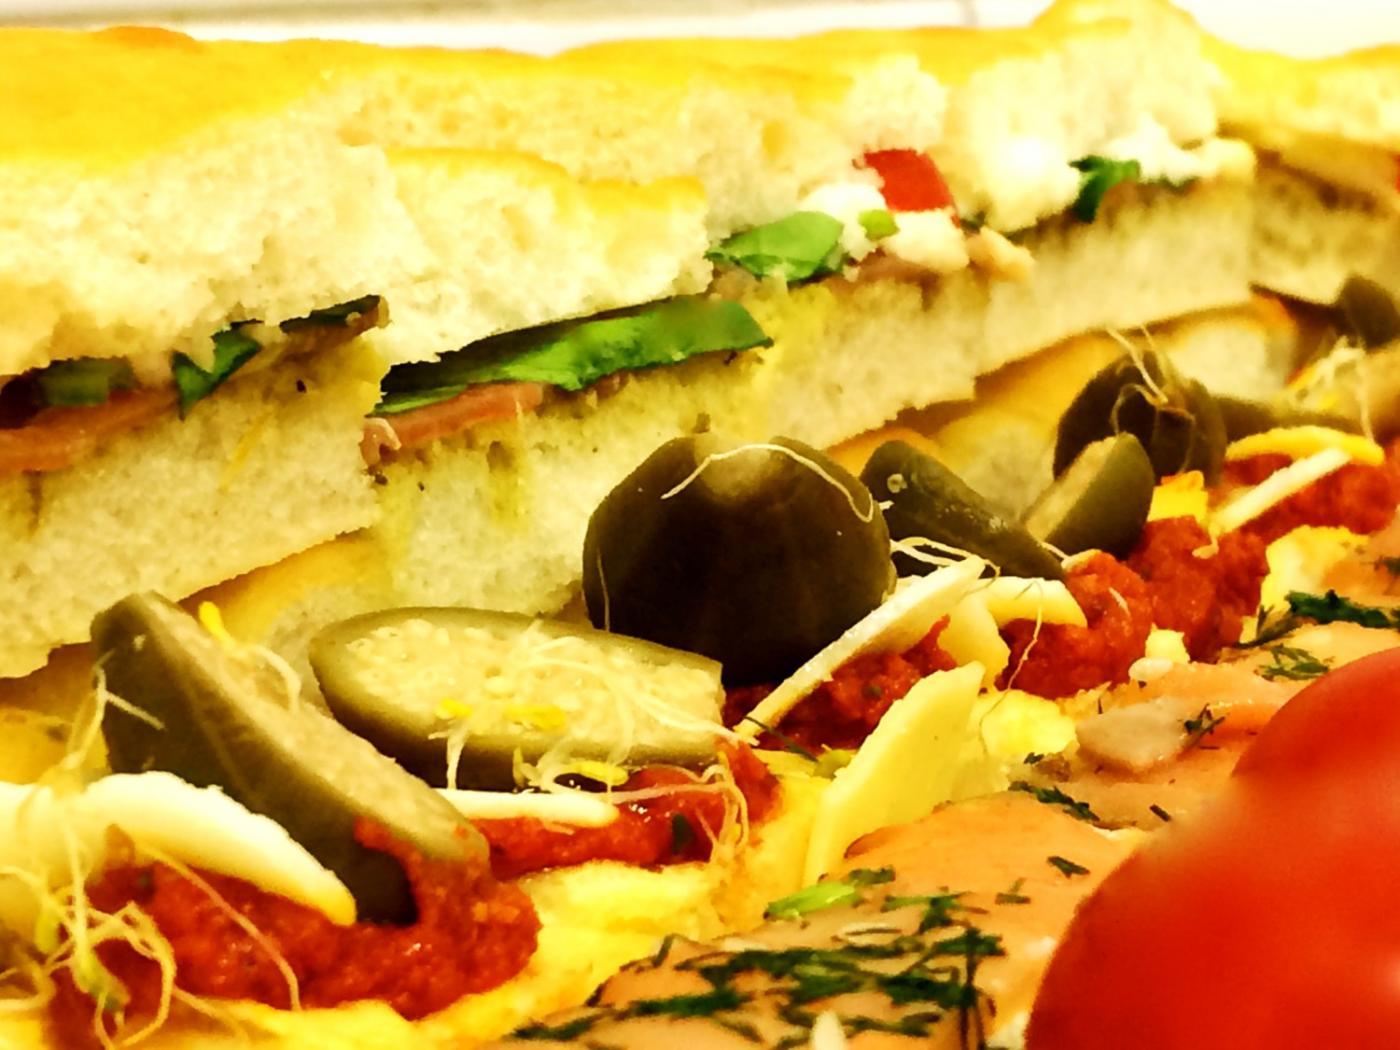 compositions-culinaires-savoureuses